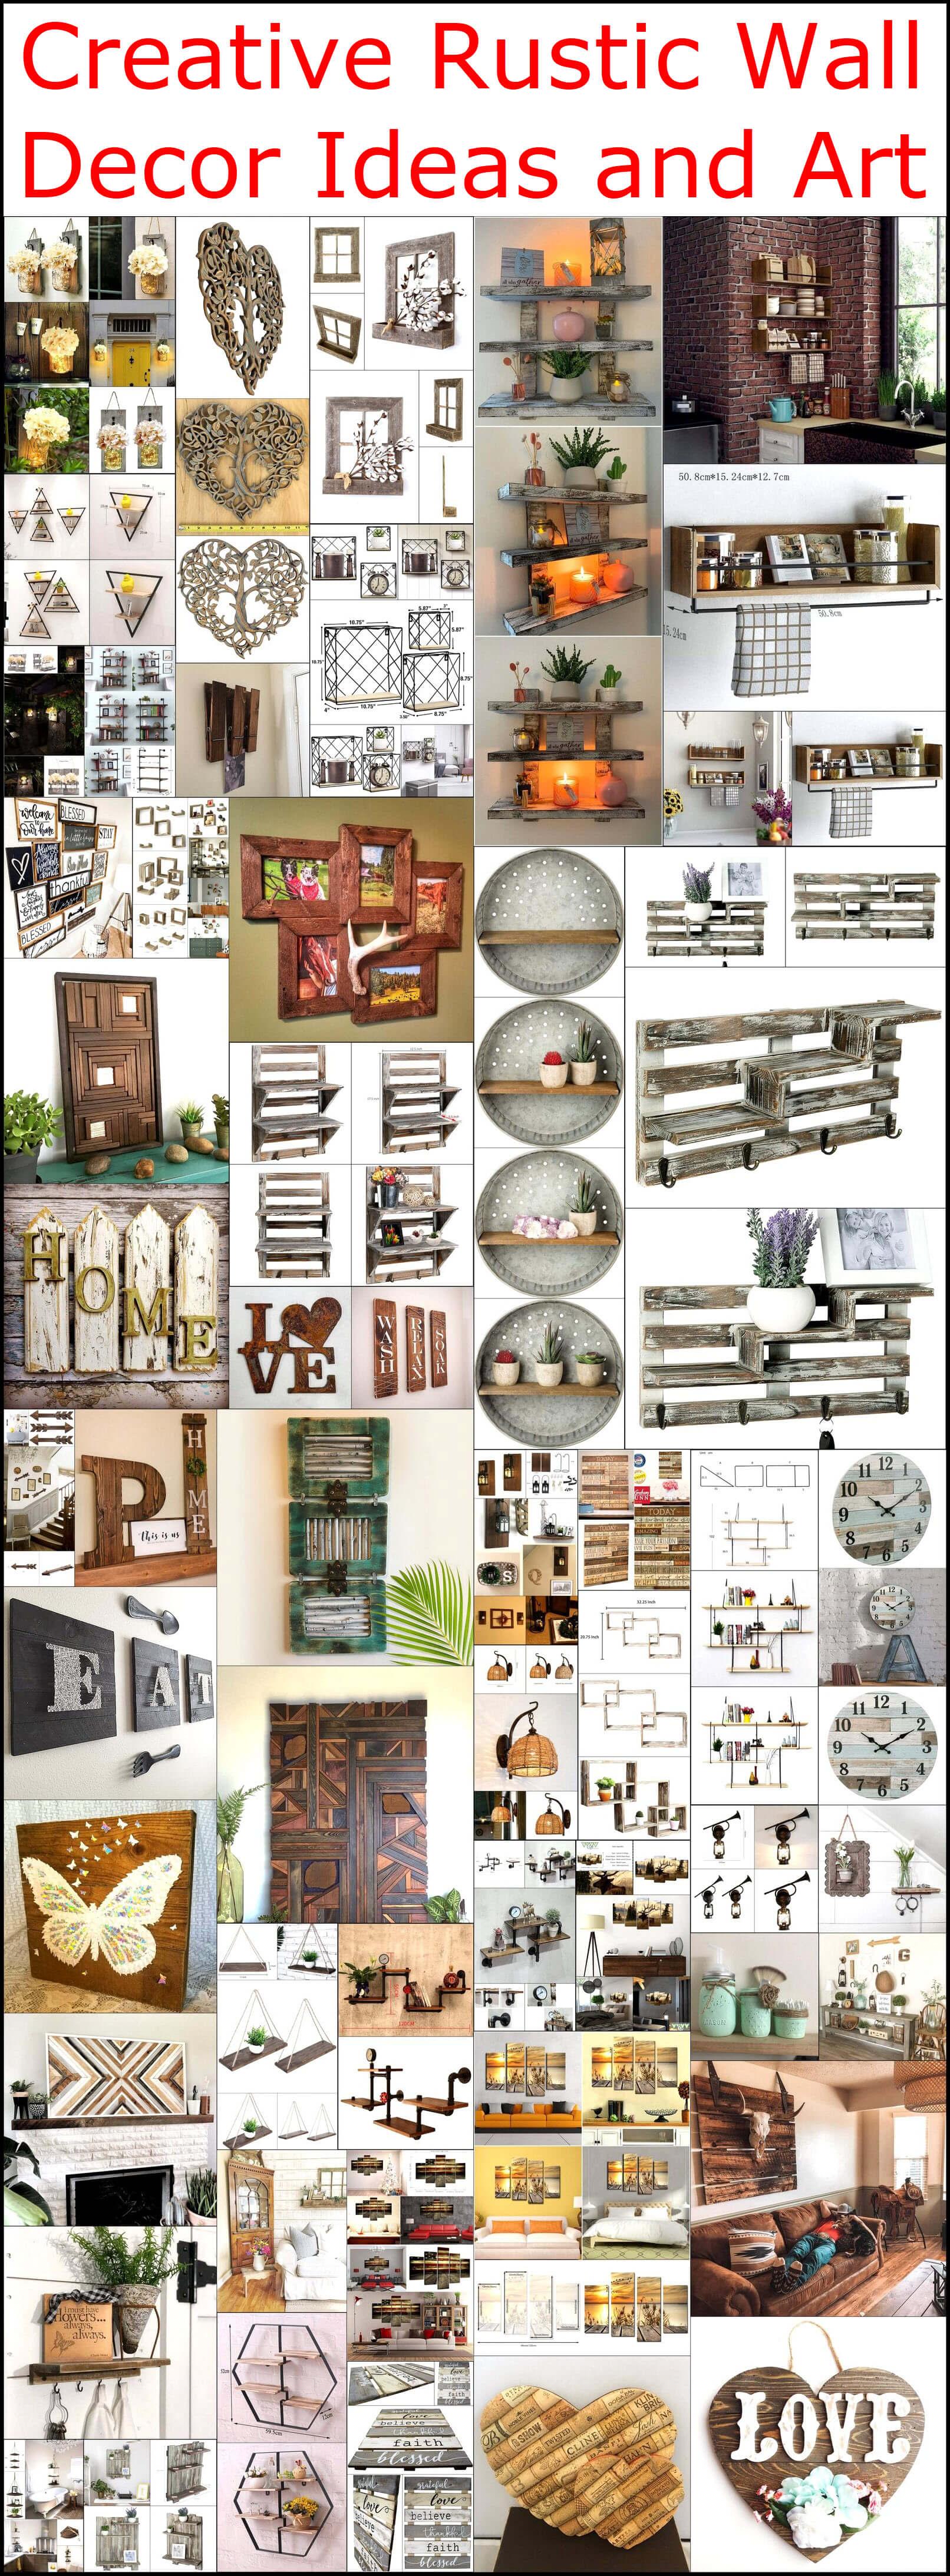 Creative Rustic Wall Decor Ideas And Art Rustic Home Decor